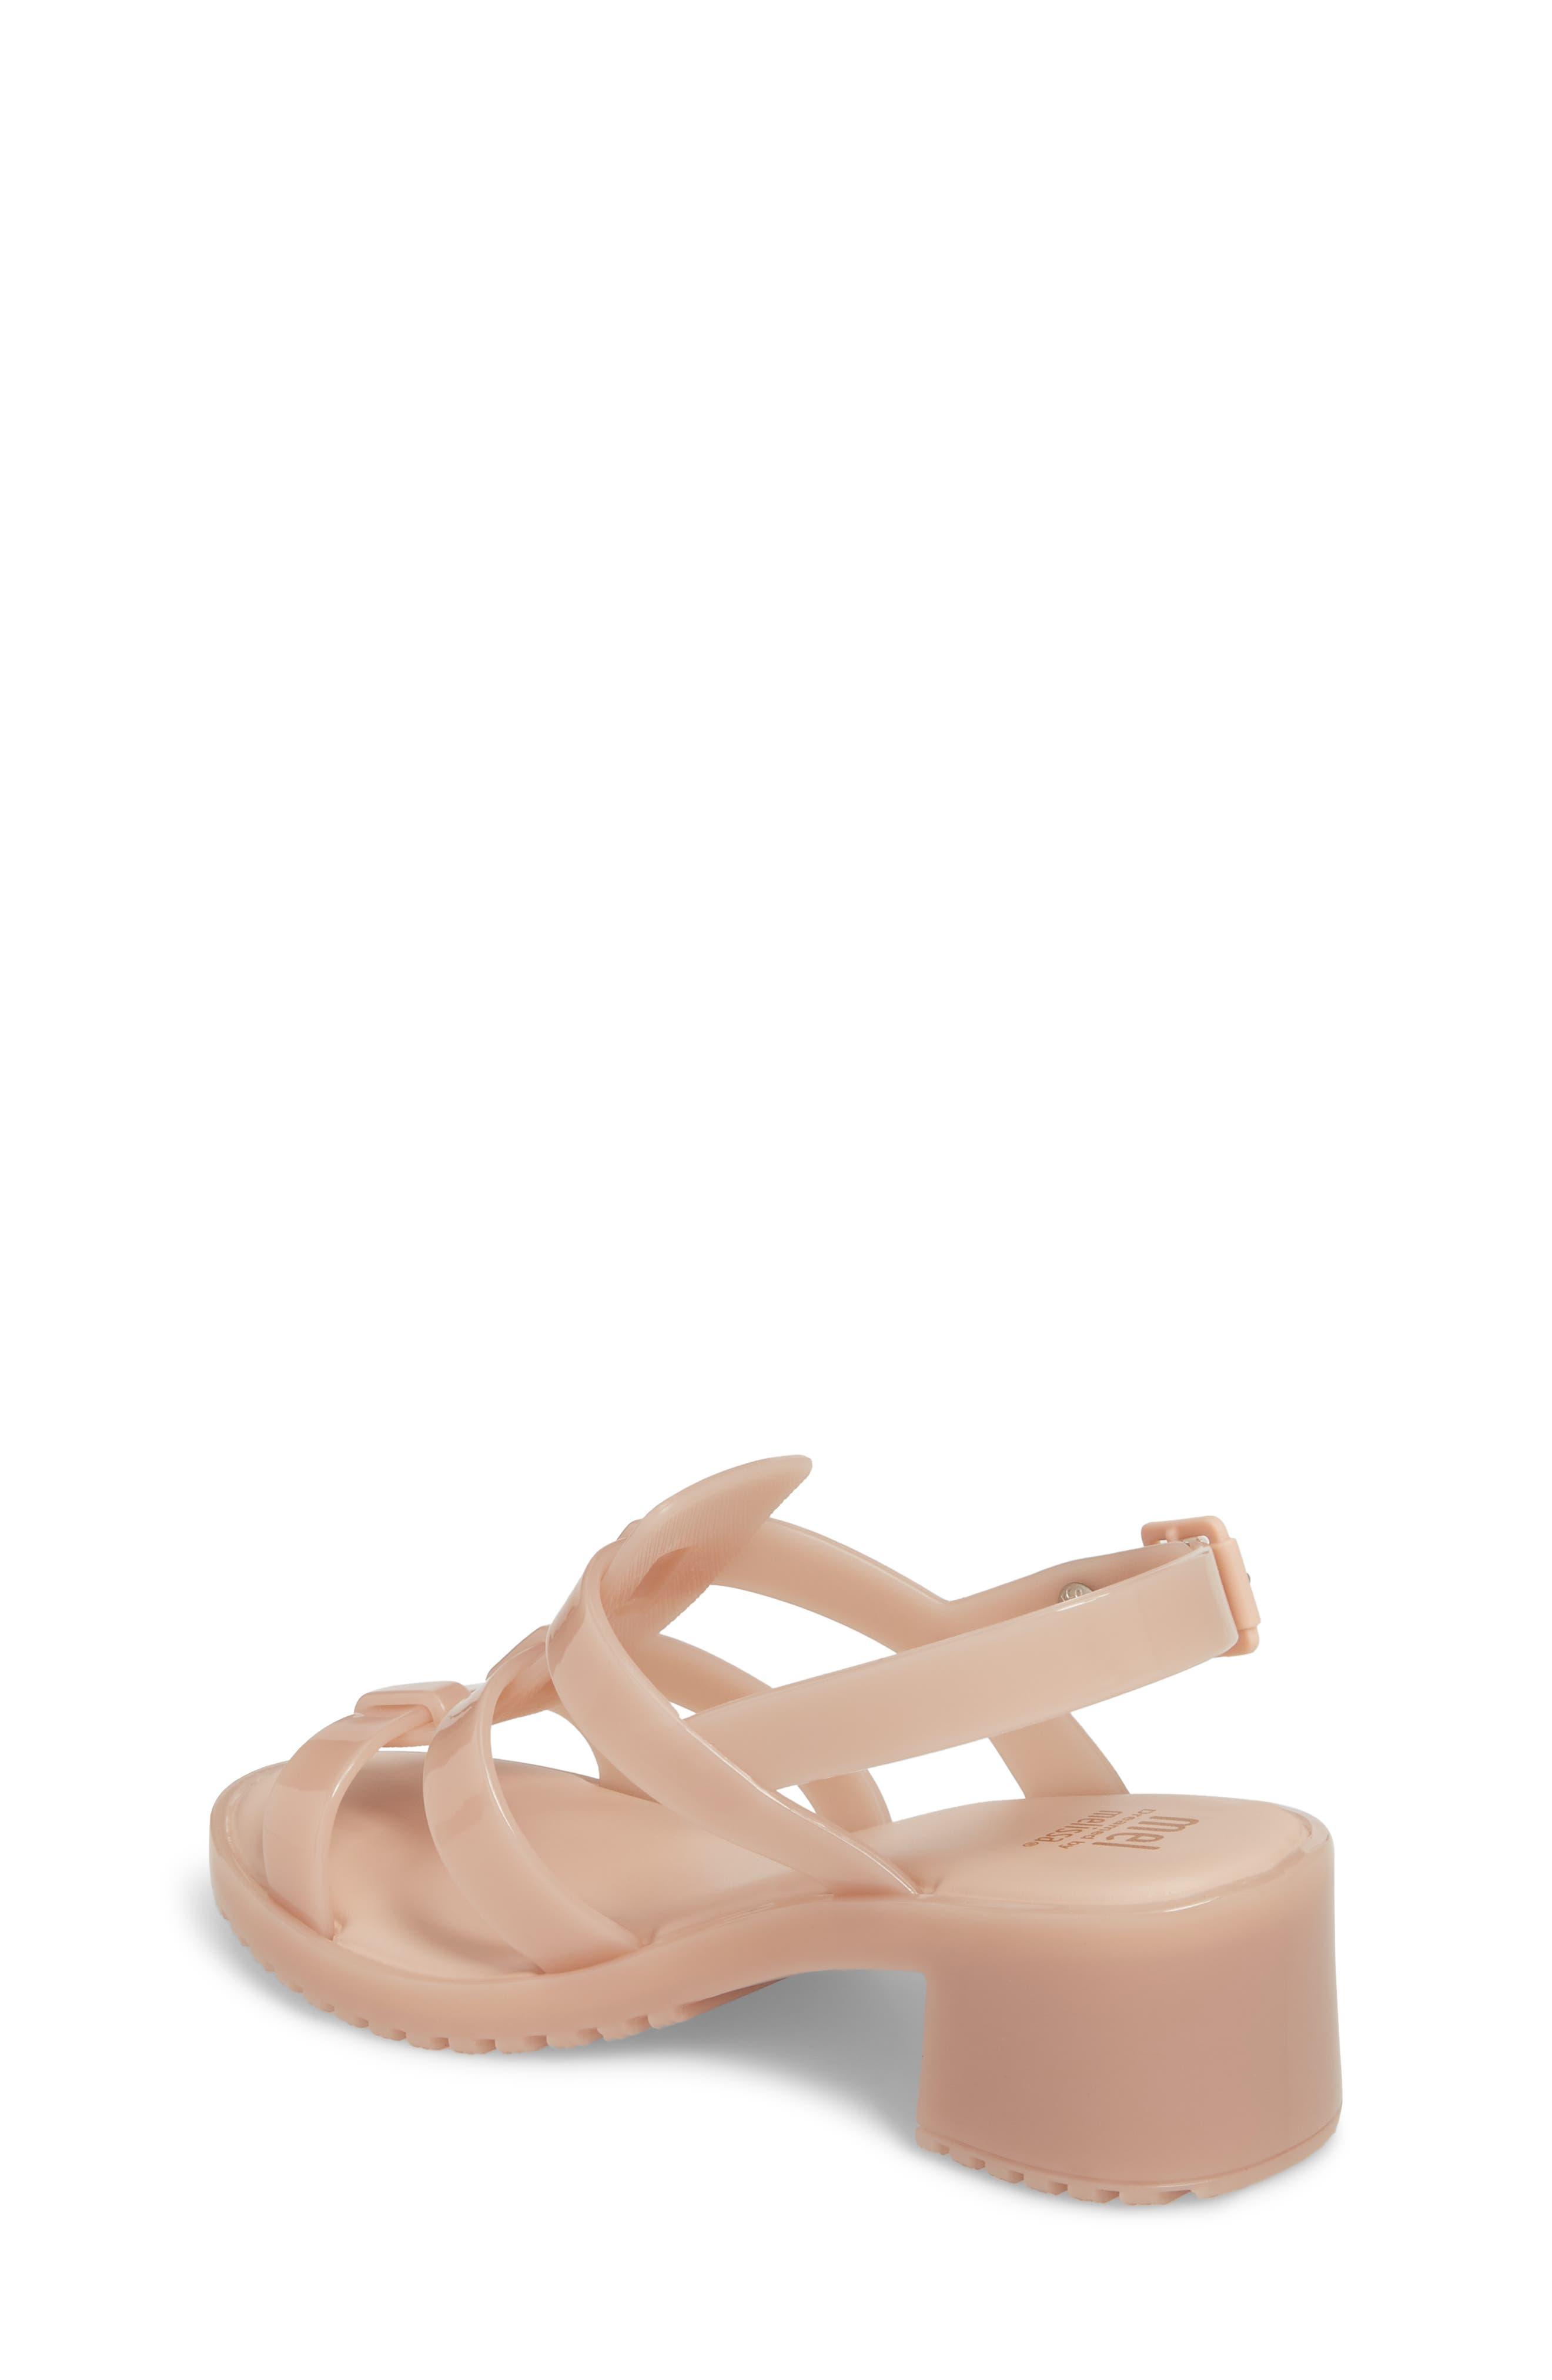 'Flox' Sandal,                             Alternate thumbnail 2, color,                             Light Pink Matte